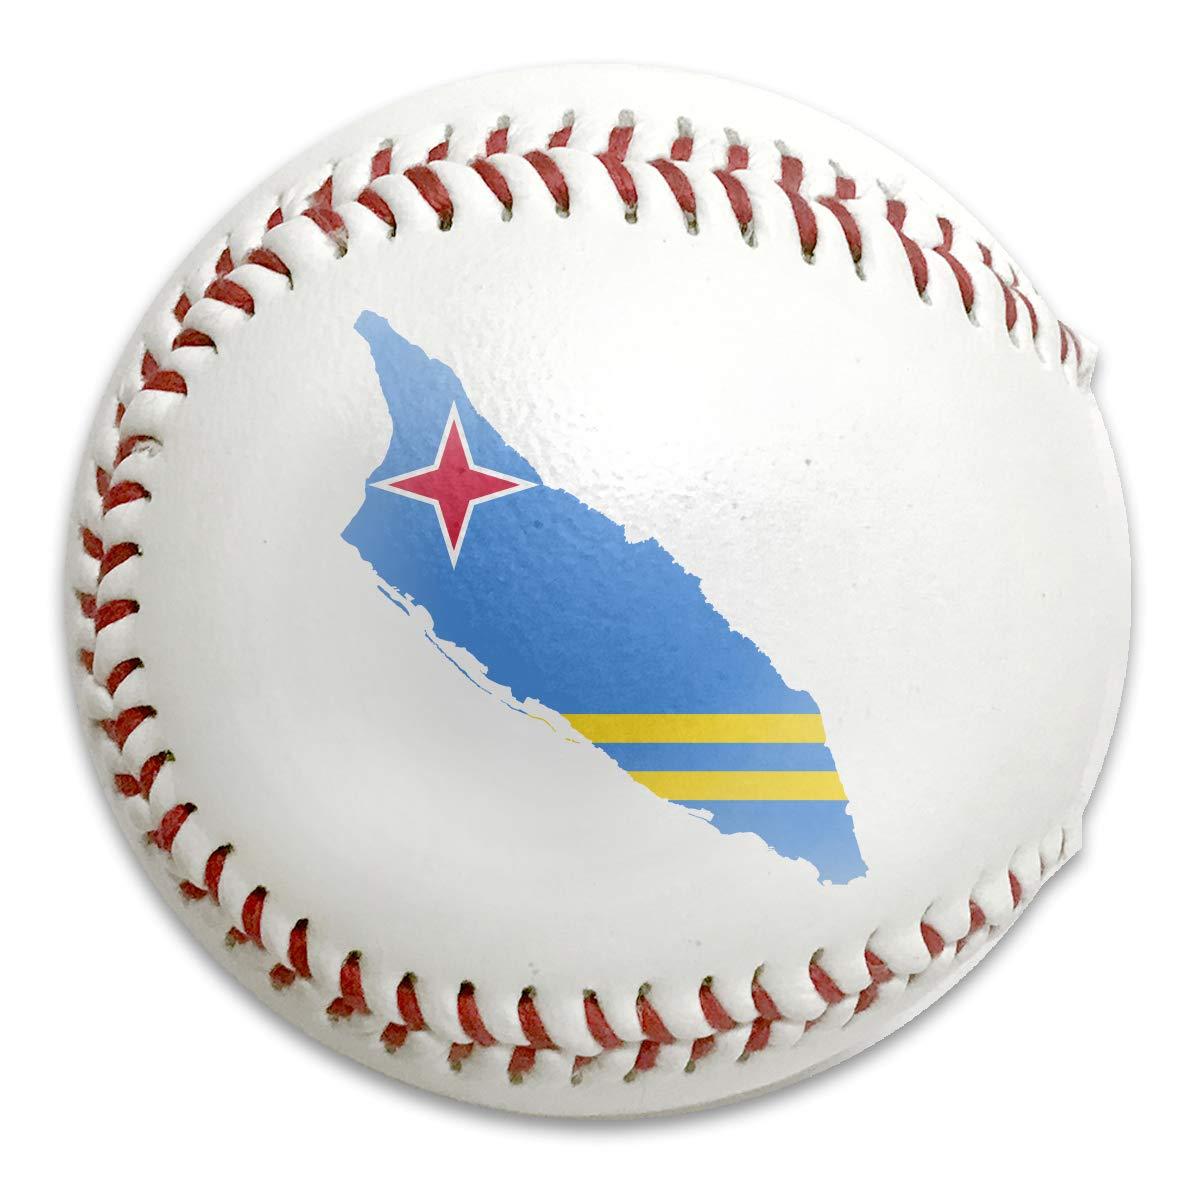 LQLDHJ Flag of Aruba Training Baseballs Outdoor Sports Baseball Standard 9 Baseball Can Be Used As A Gift